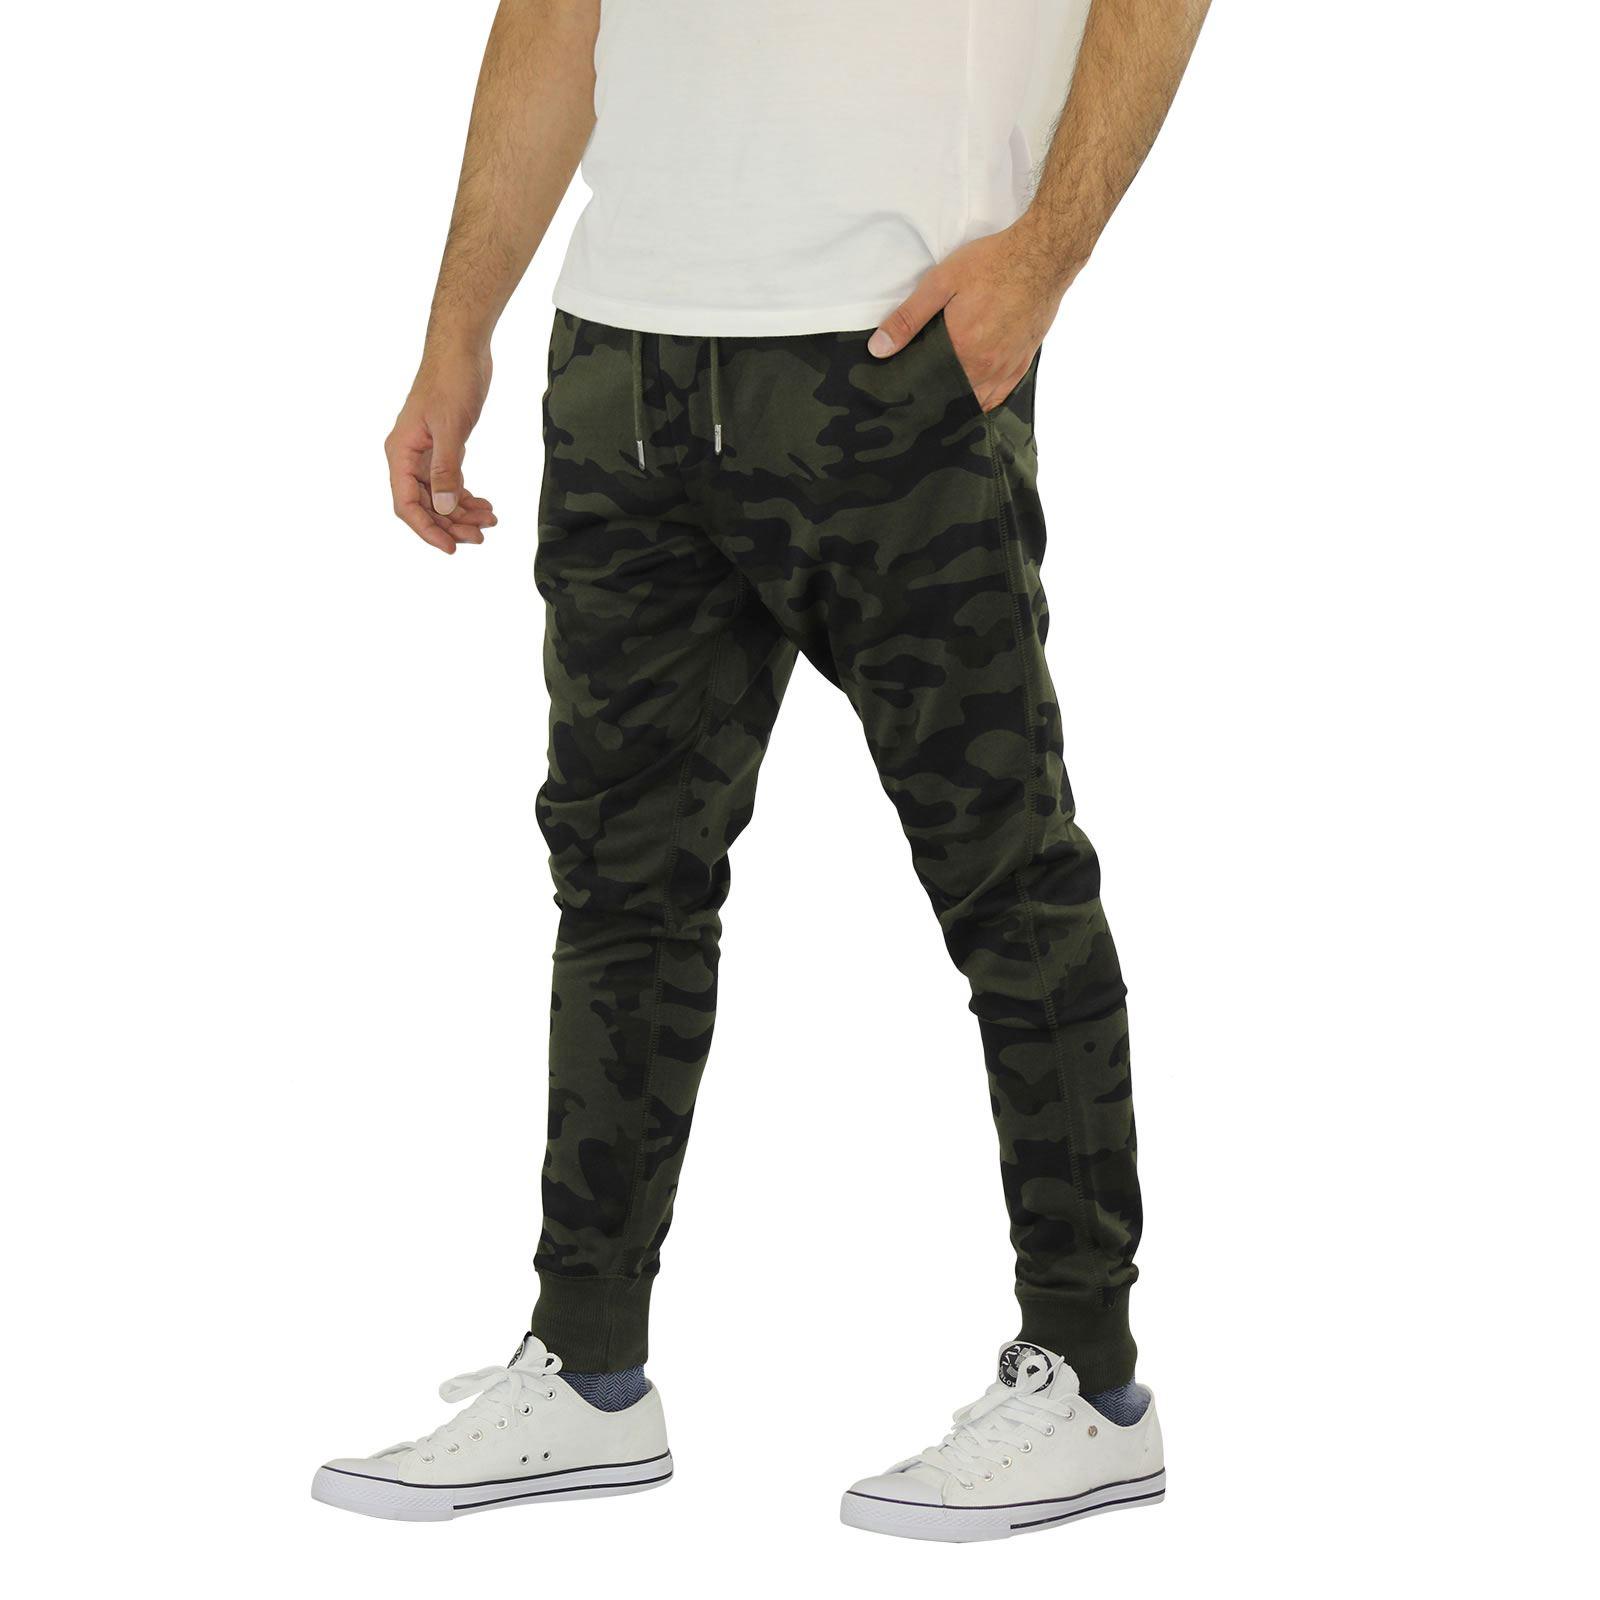 Pantalon coupe skinny homme